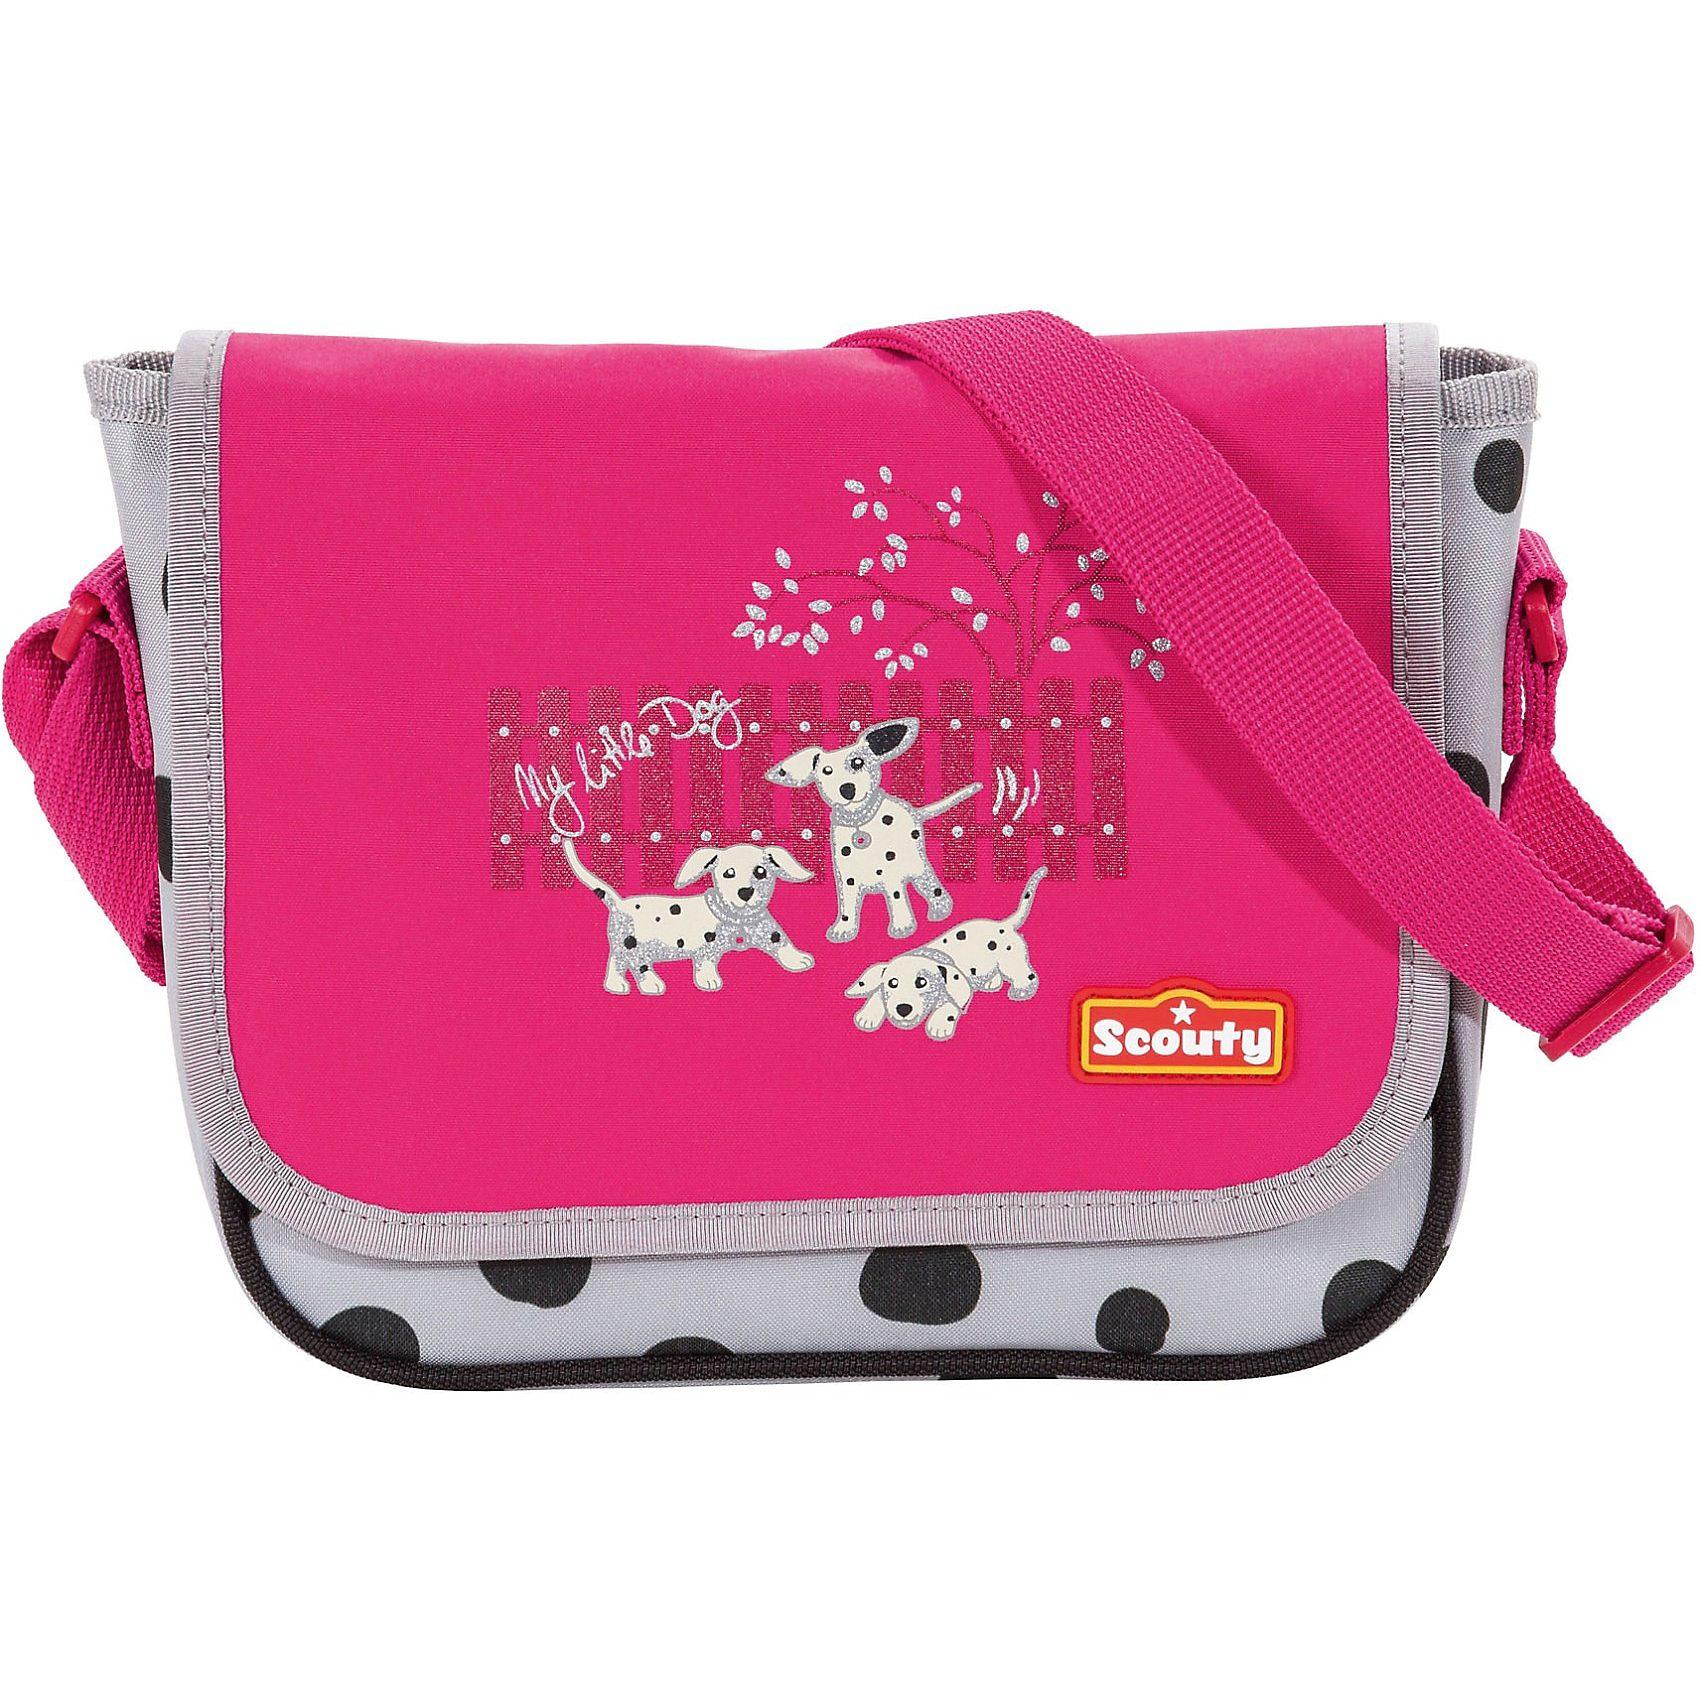 Scout Y Kindertasche Dalmatiner